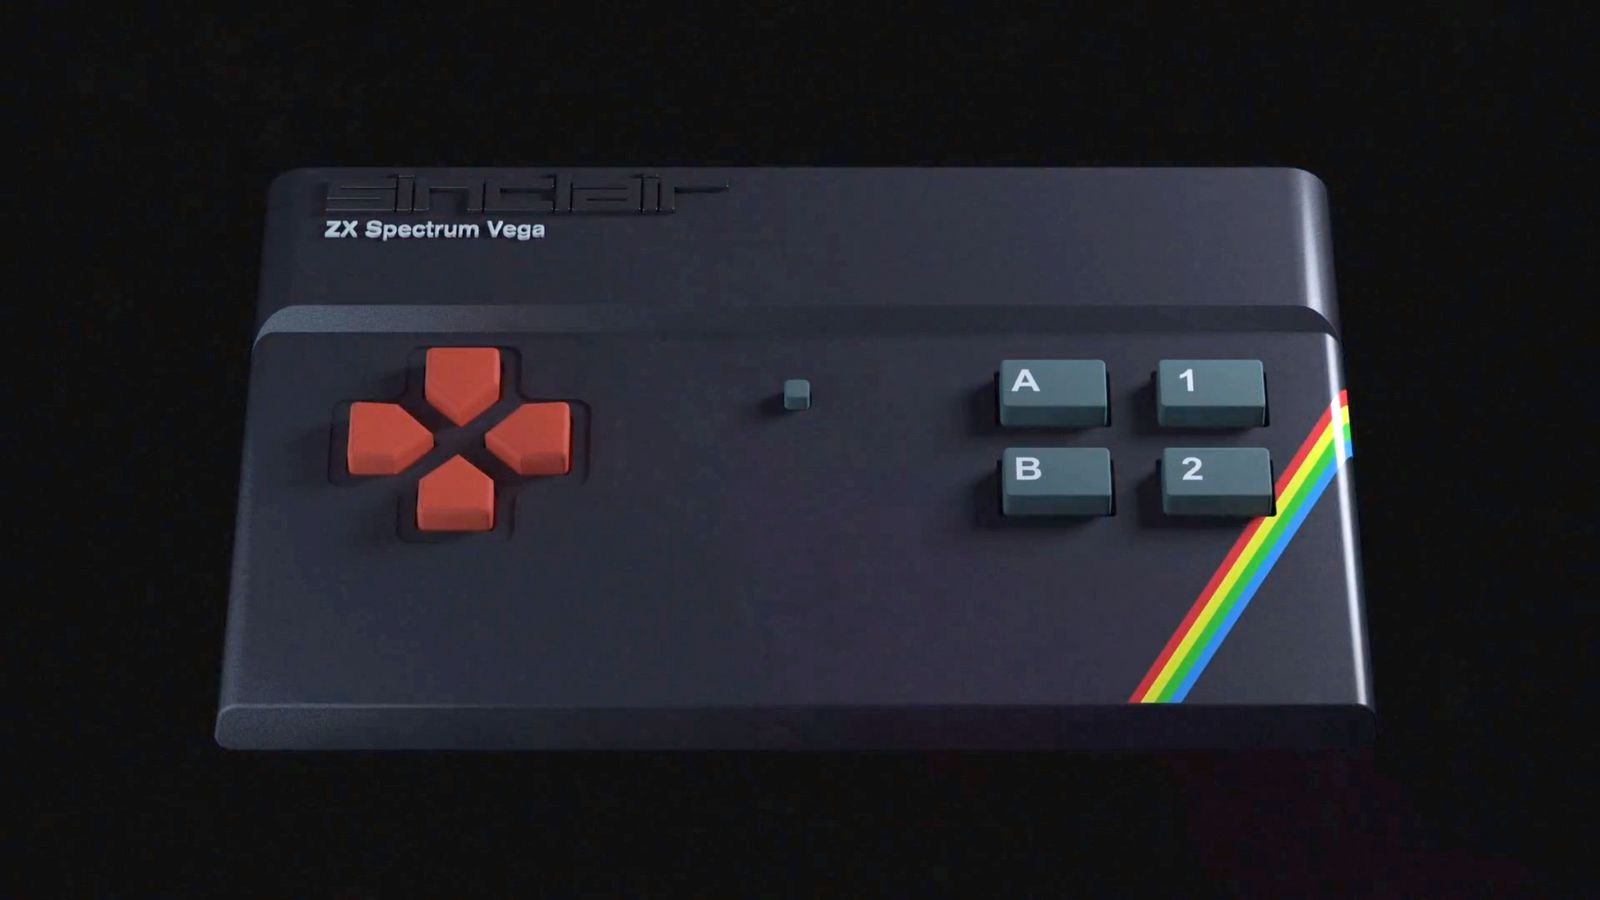 NUR ALS ZITAT Screenshot Sinclair ZX Spectrum Vega